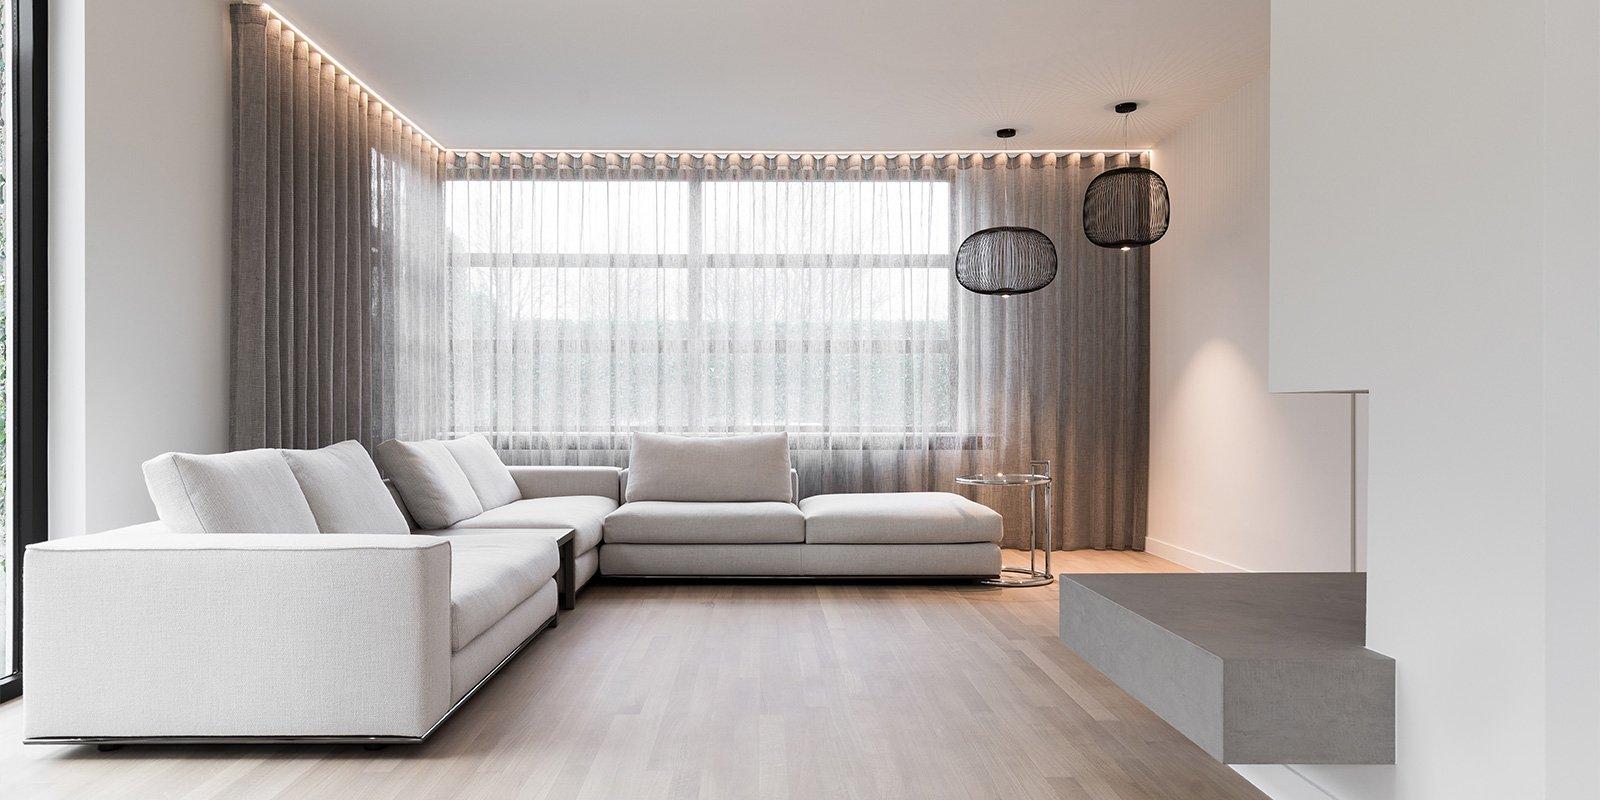 strak en minimalistisch, loft4c, filip deslee, minimalistisch, ruimtelijk, licht